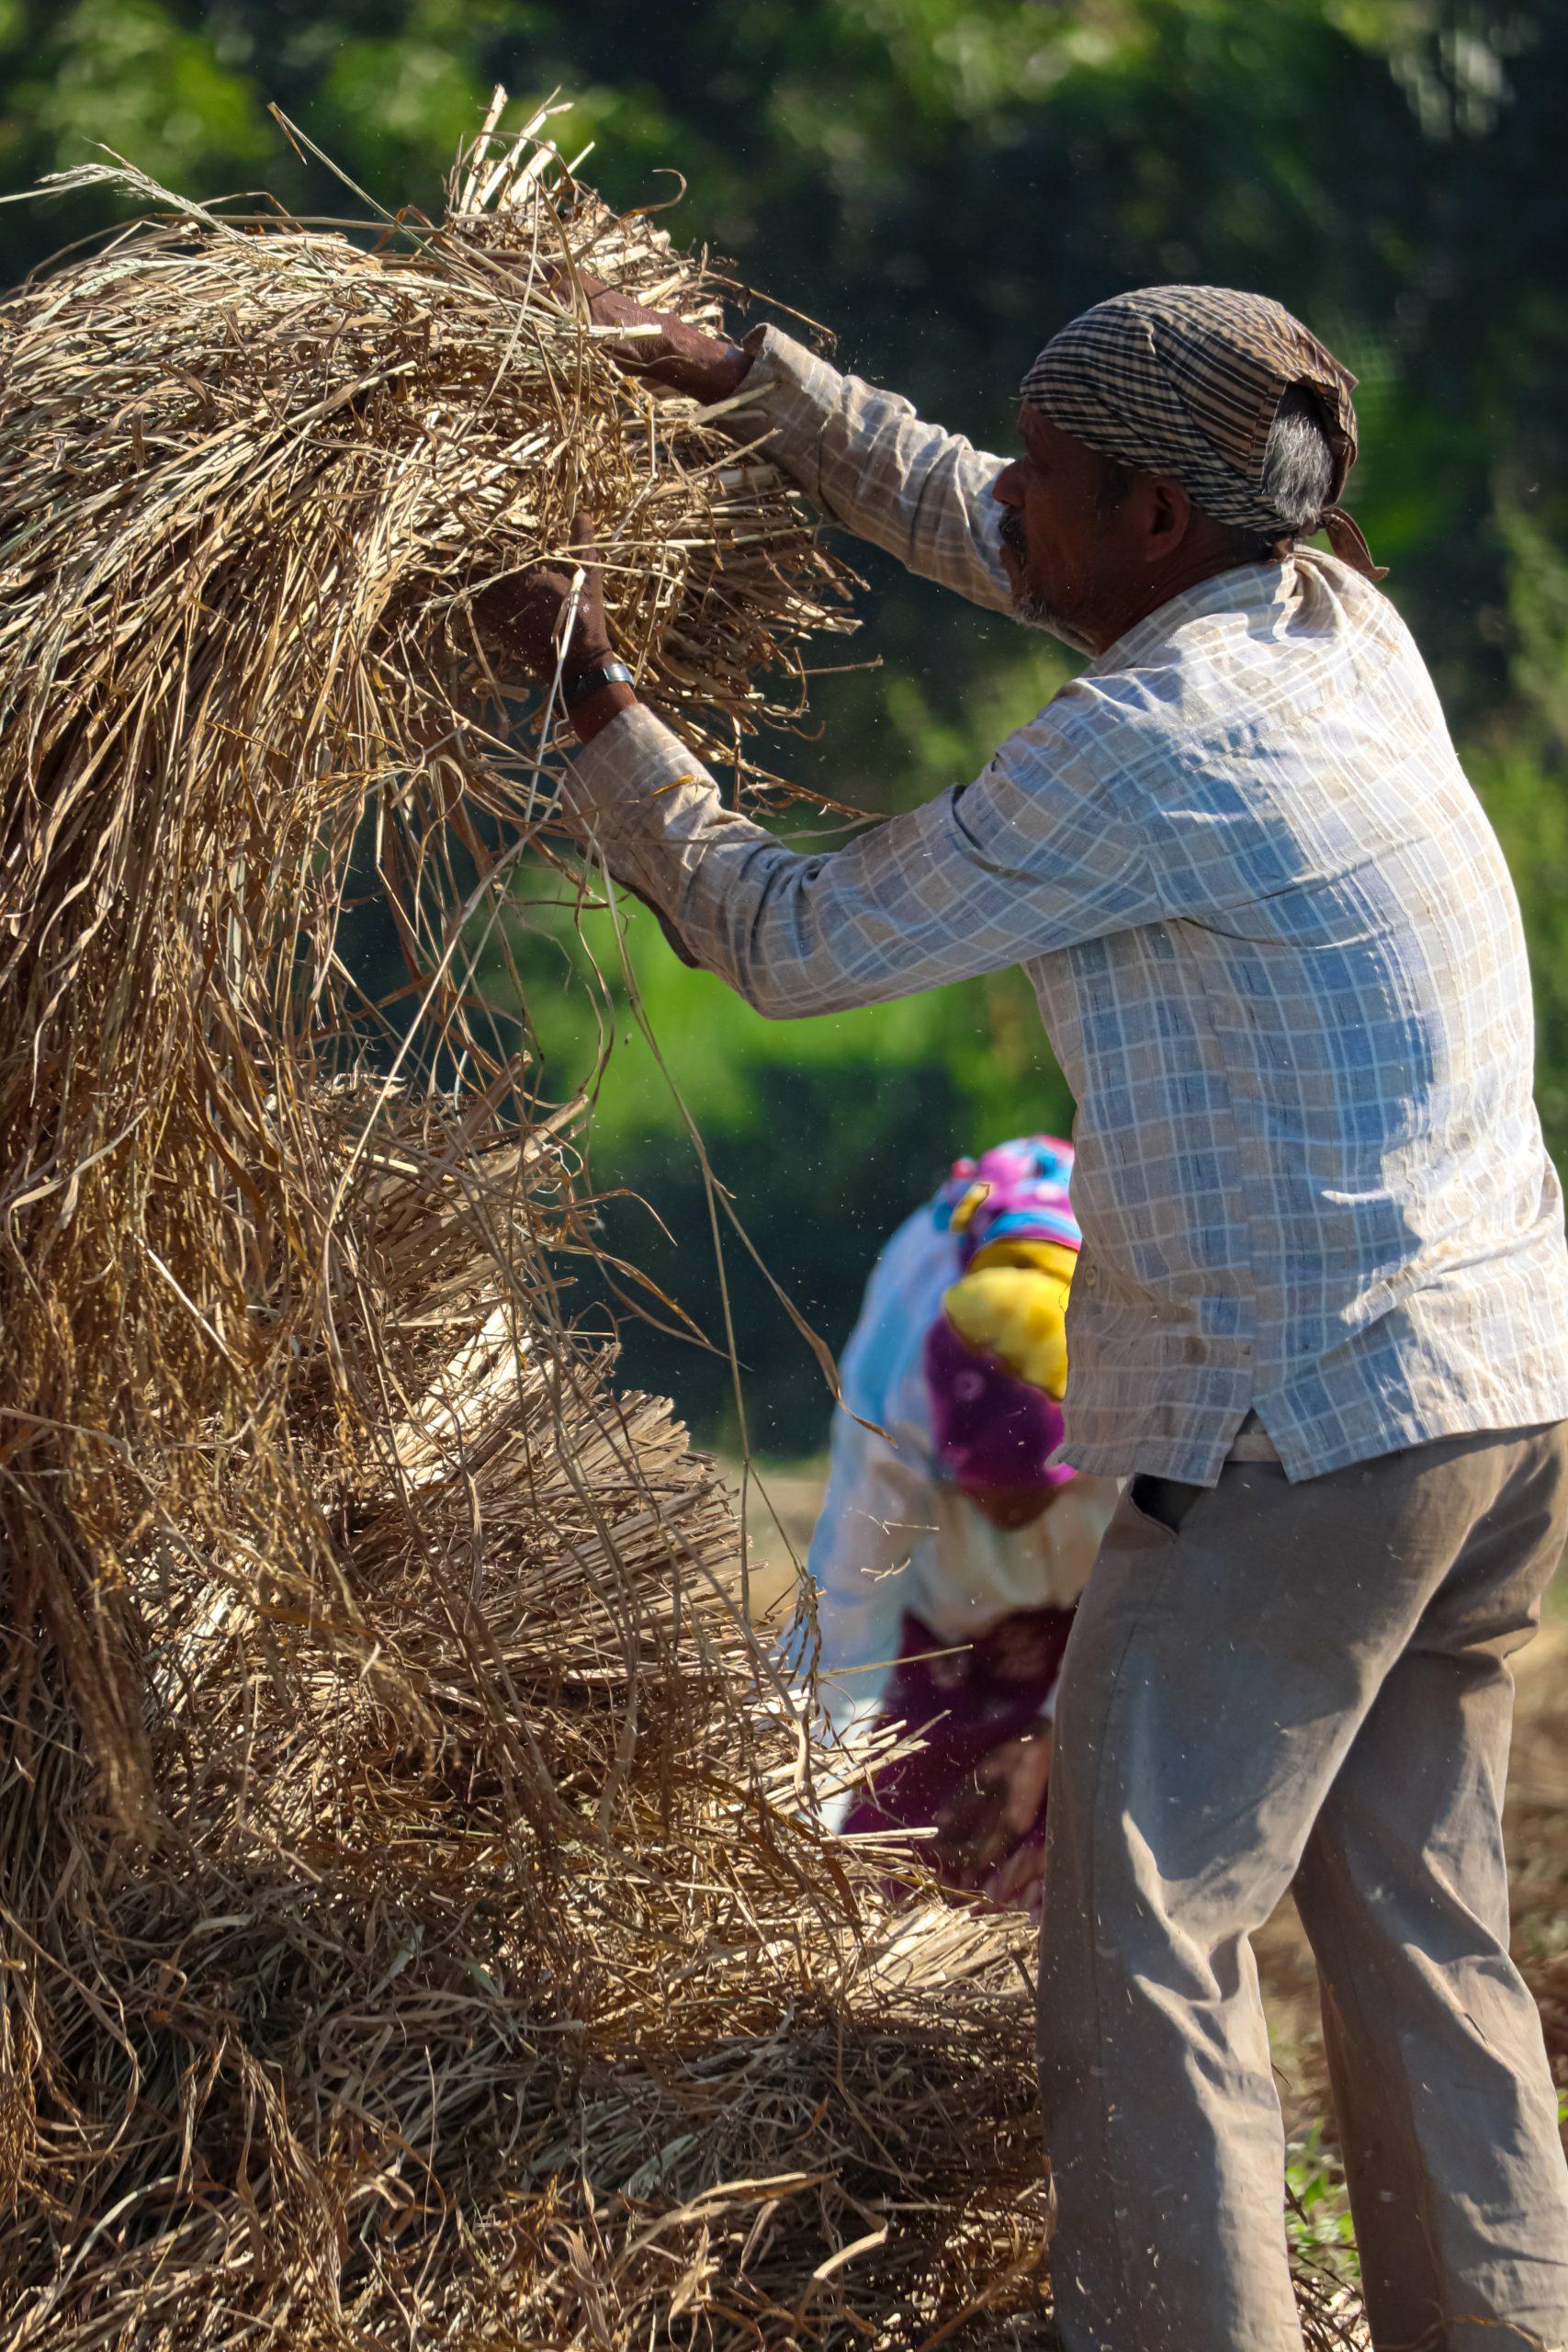 A man lifting rice plant bundles